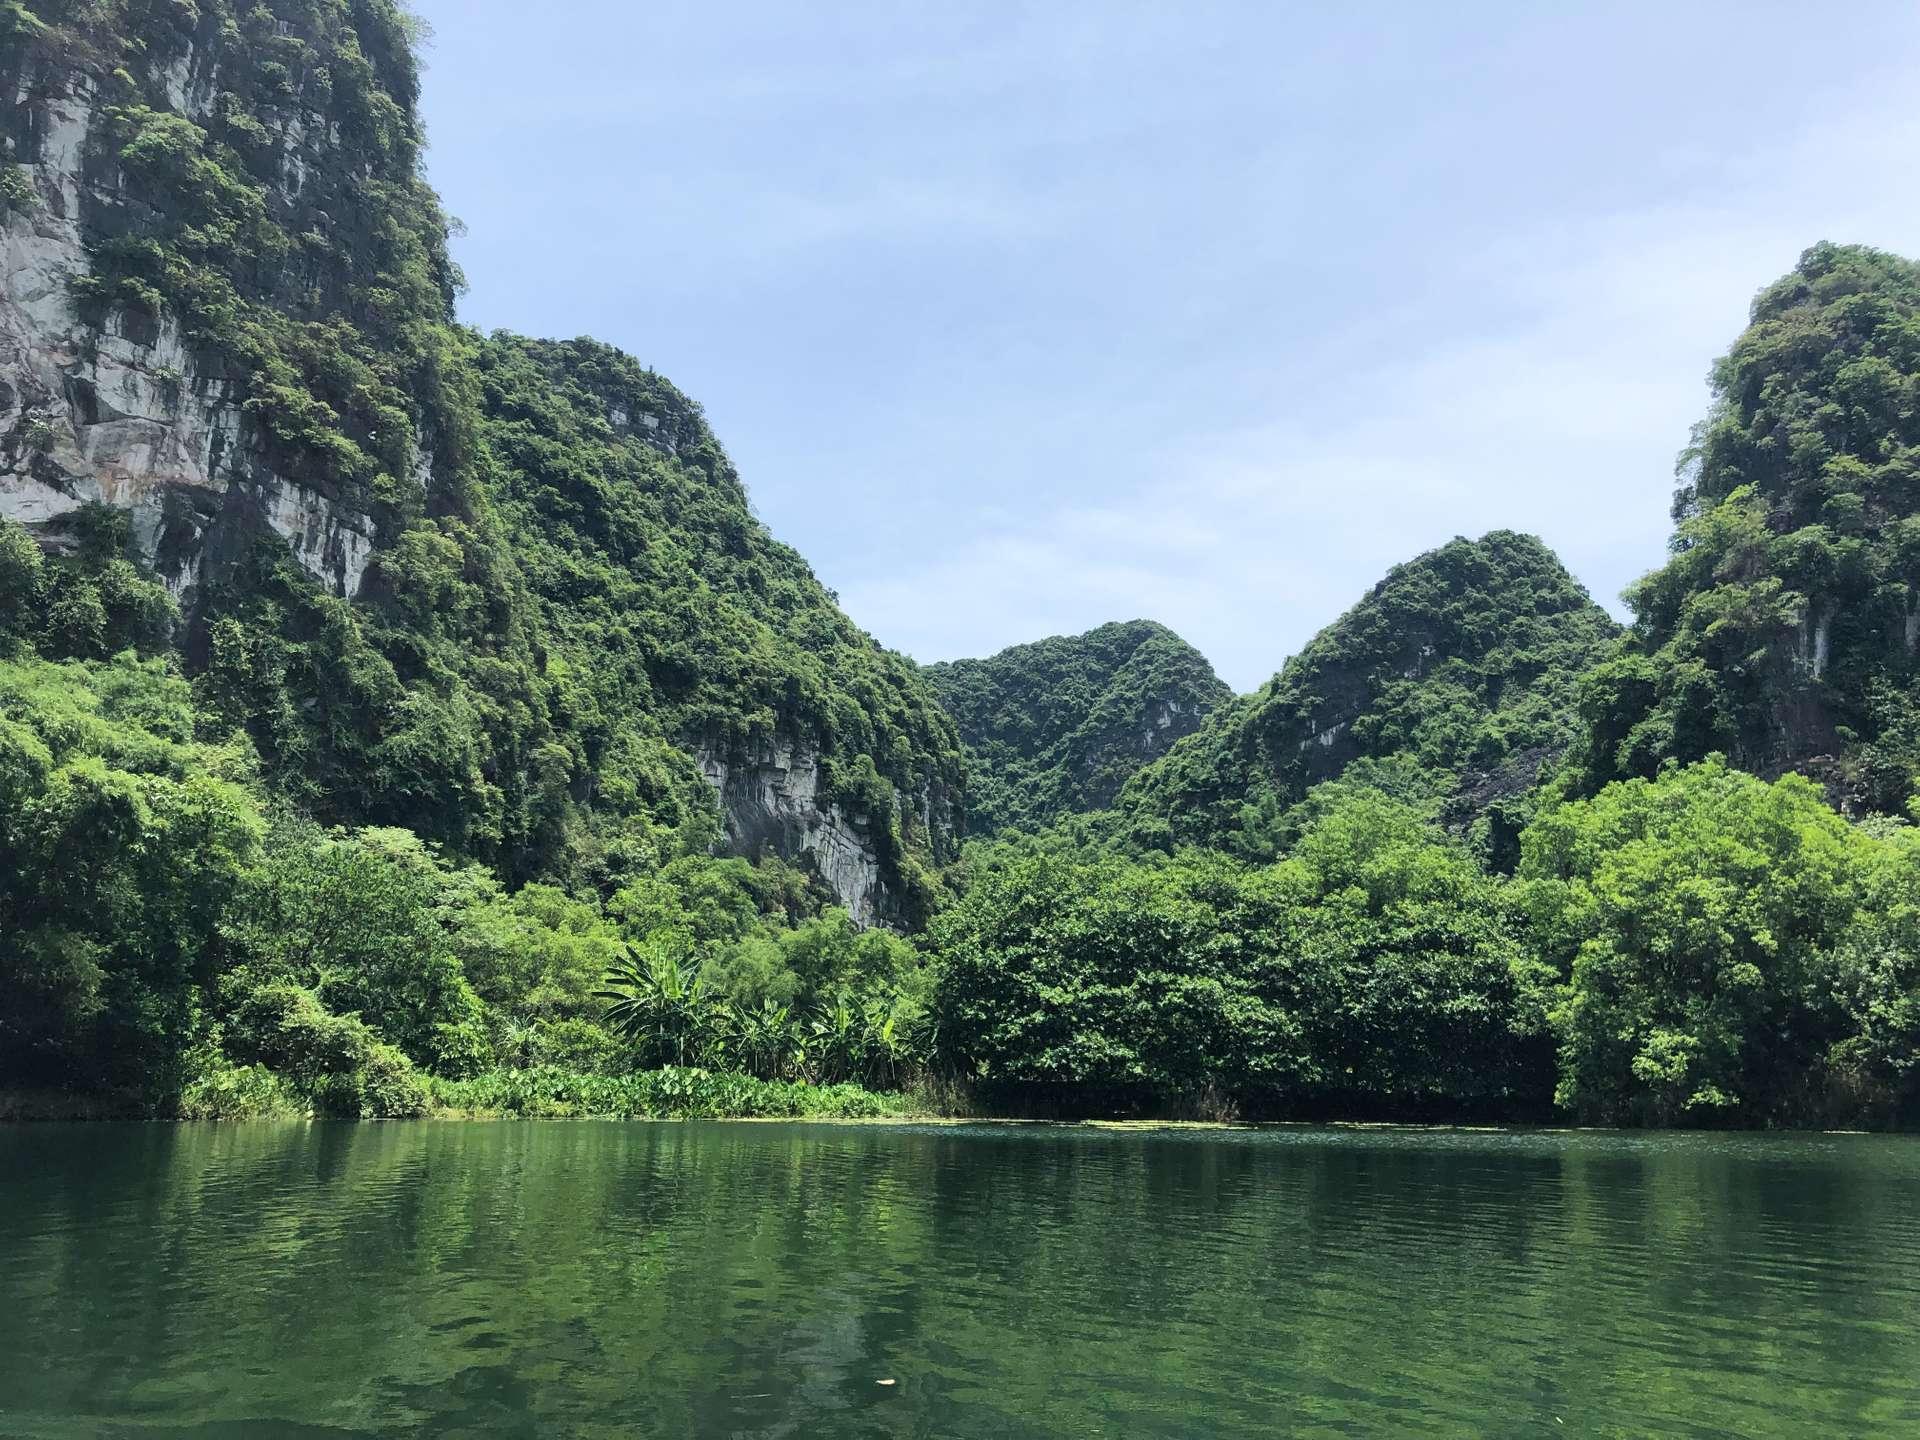 Vietnam, Ninh Binh, Hang Mua